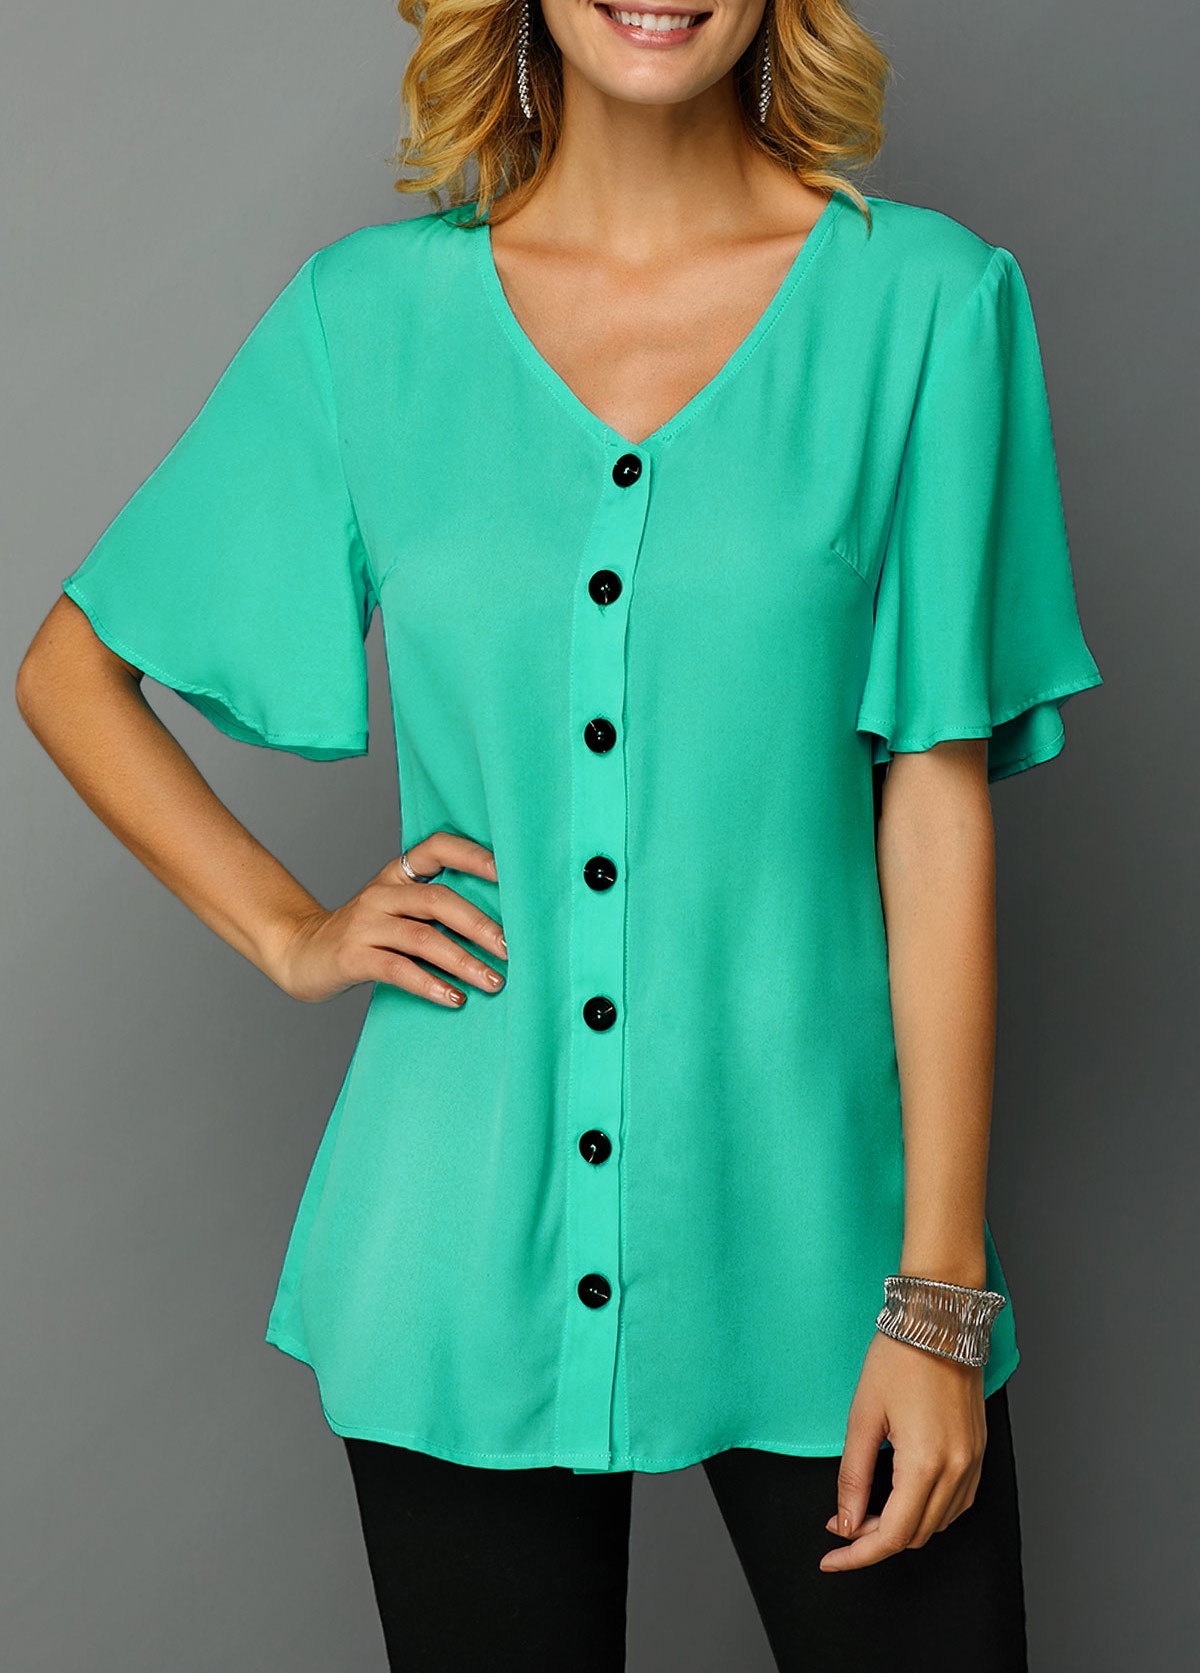 ROTITA Button Up V Neck Short Sleeve T Shirt